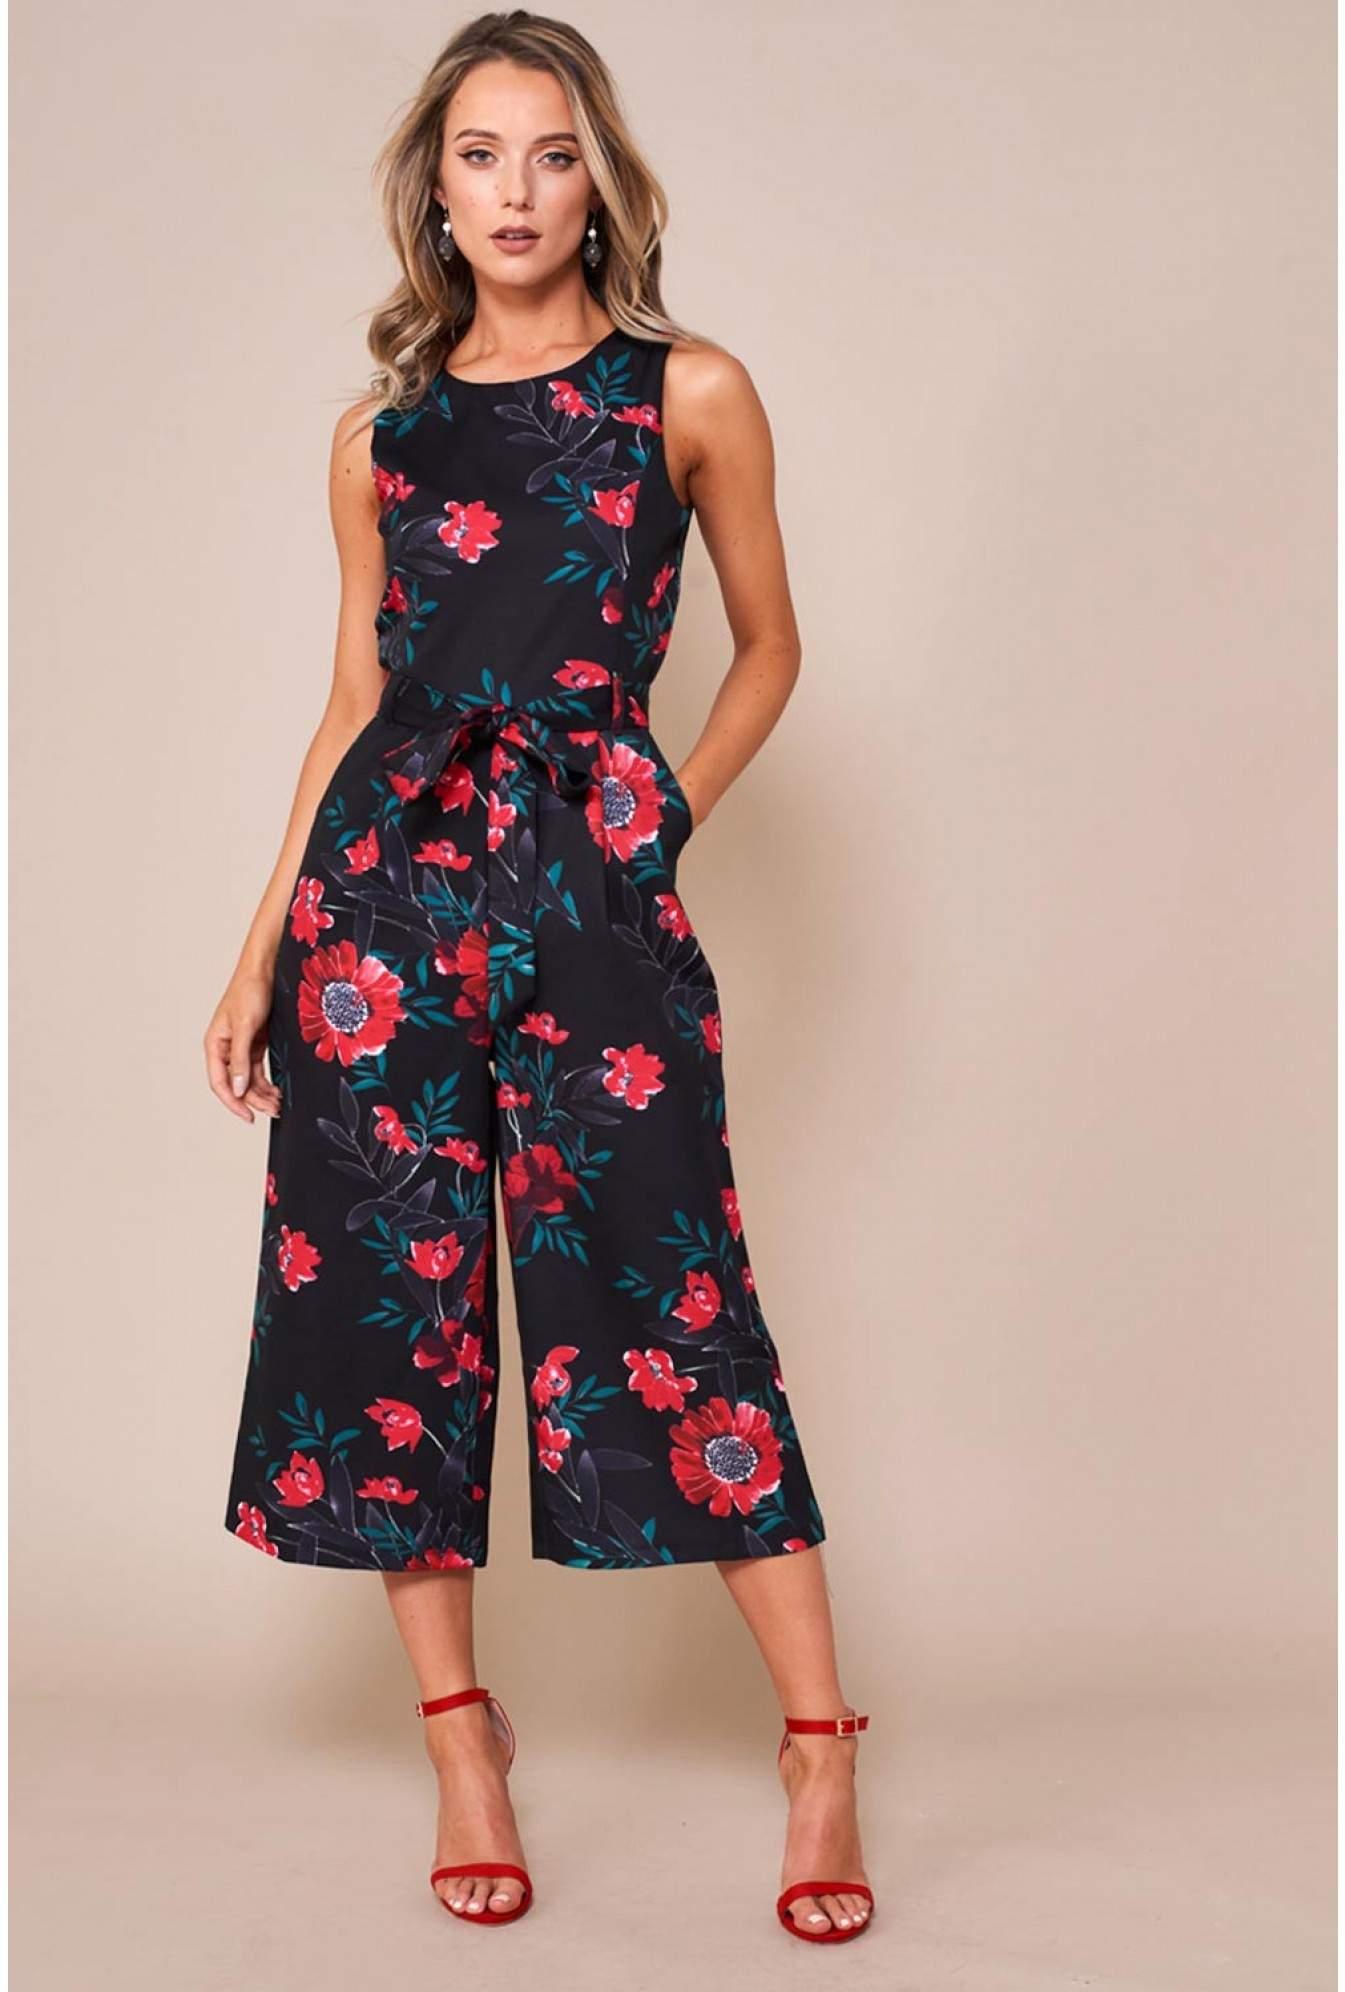 70ae65a12202 Marc Angelo Katie Longline Floral Jumpsuit in Black